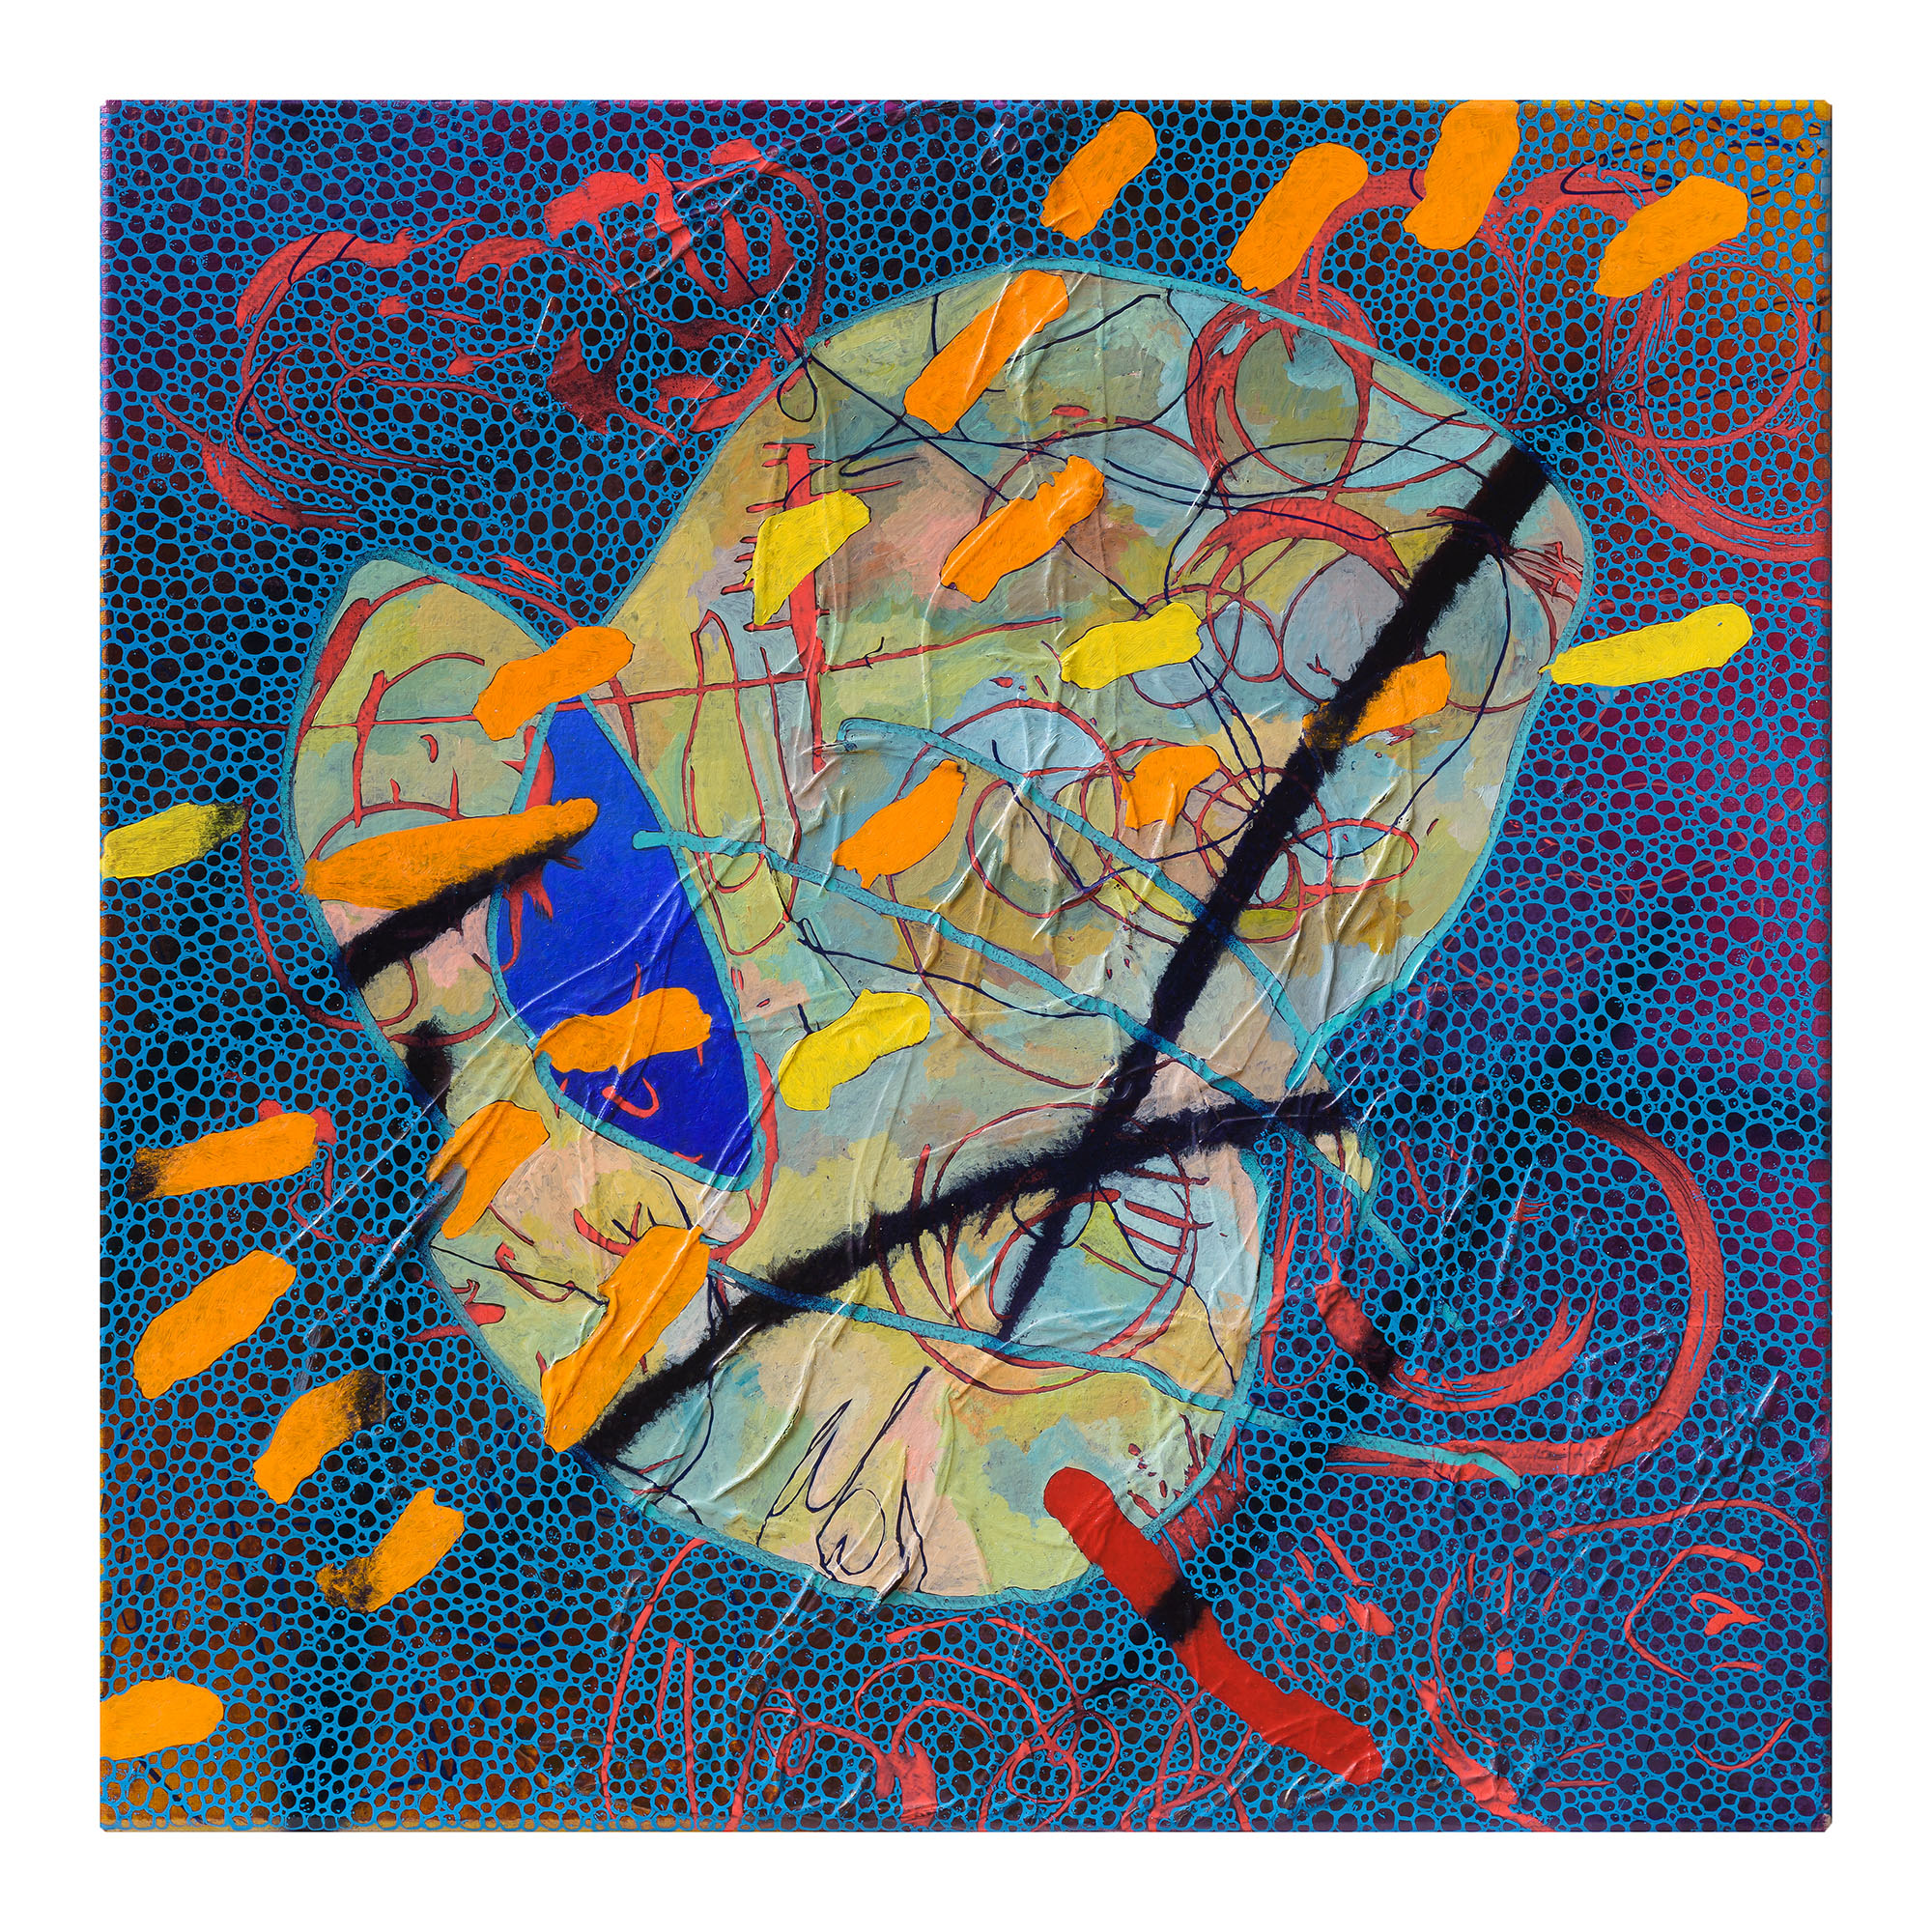 EVAN WOODRUFFE  15th January 2019  acrylic, fabric & mica on linen 50 × 50 cm